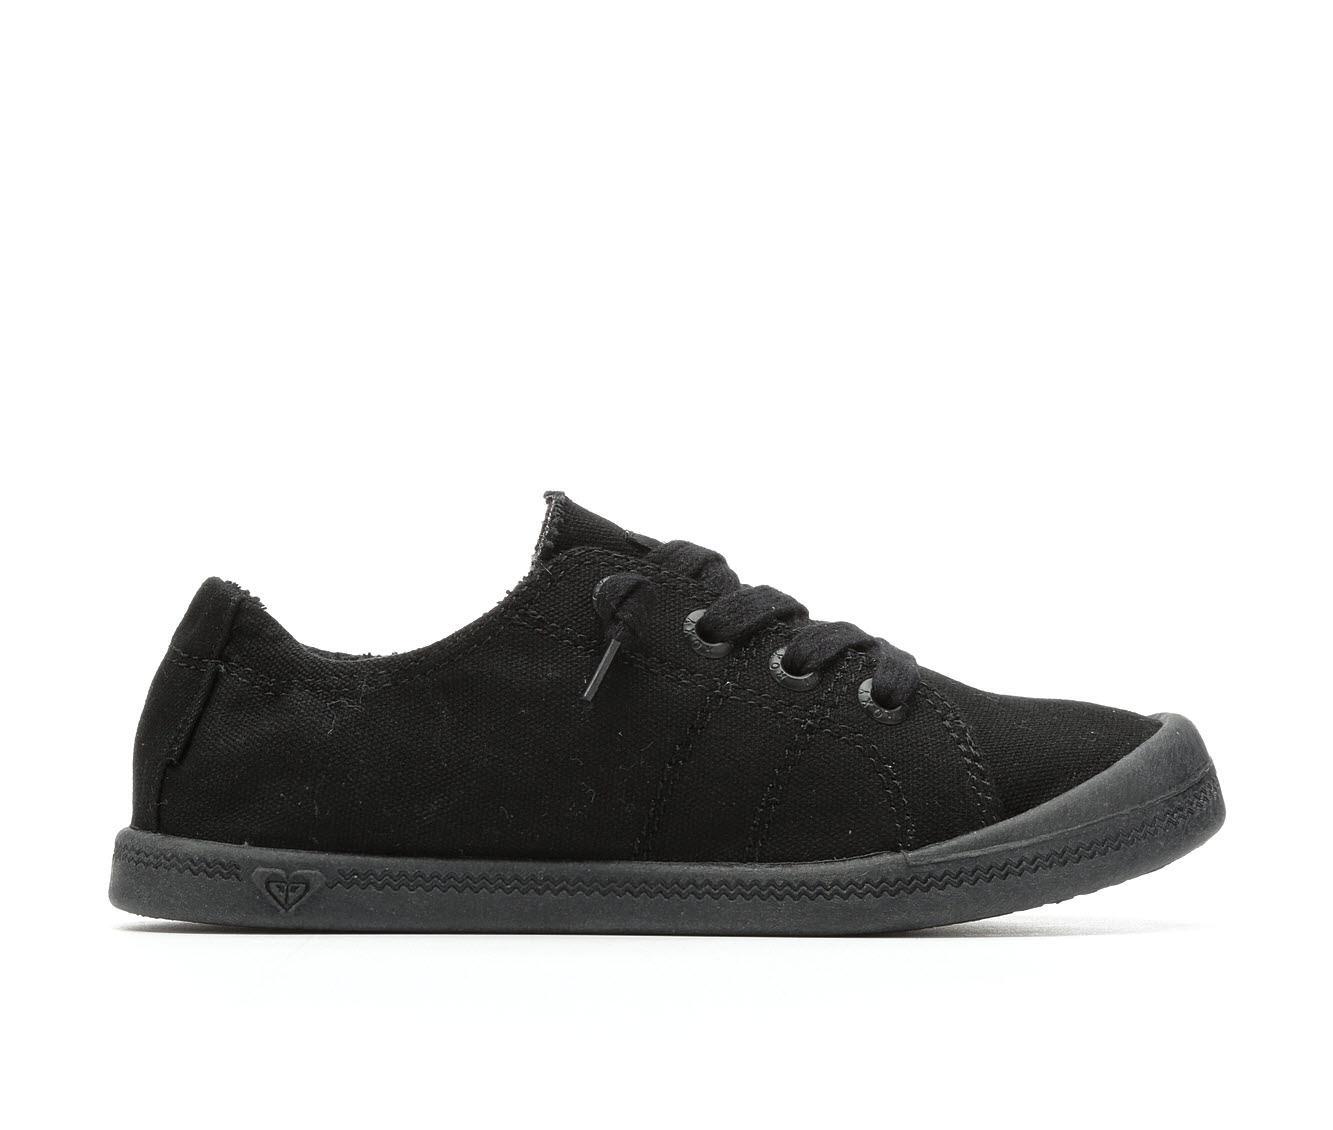 Girls' Roxy RG Bayshore Sneakers (Black)